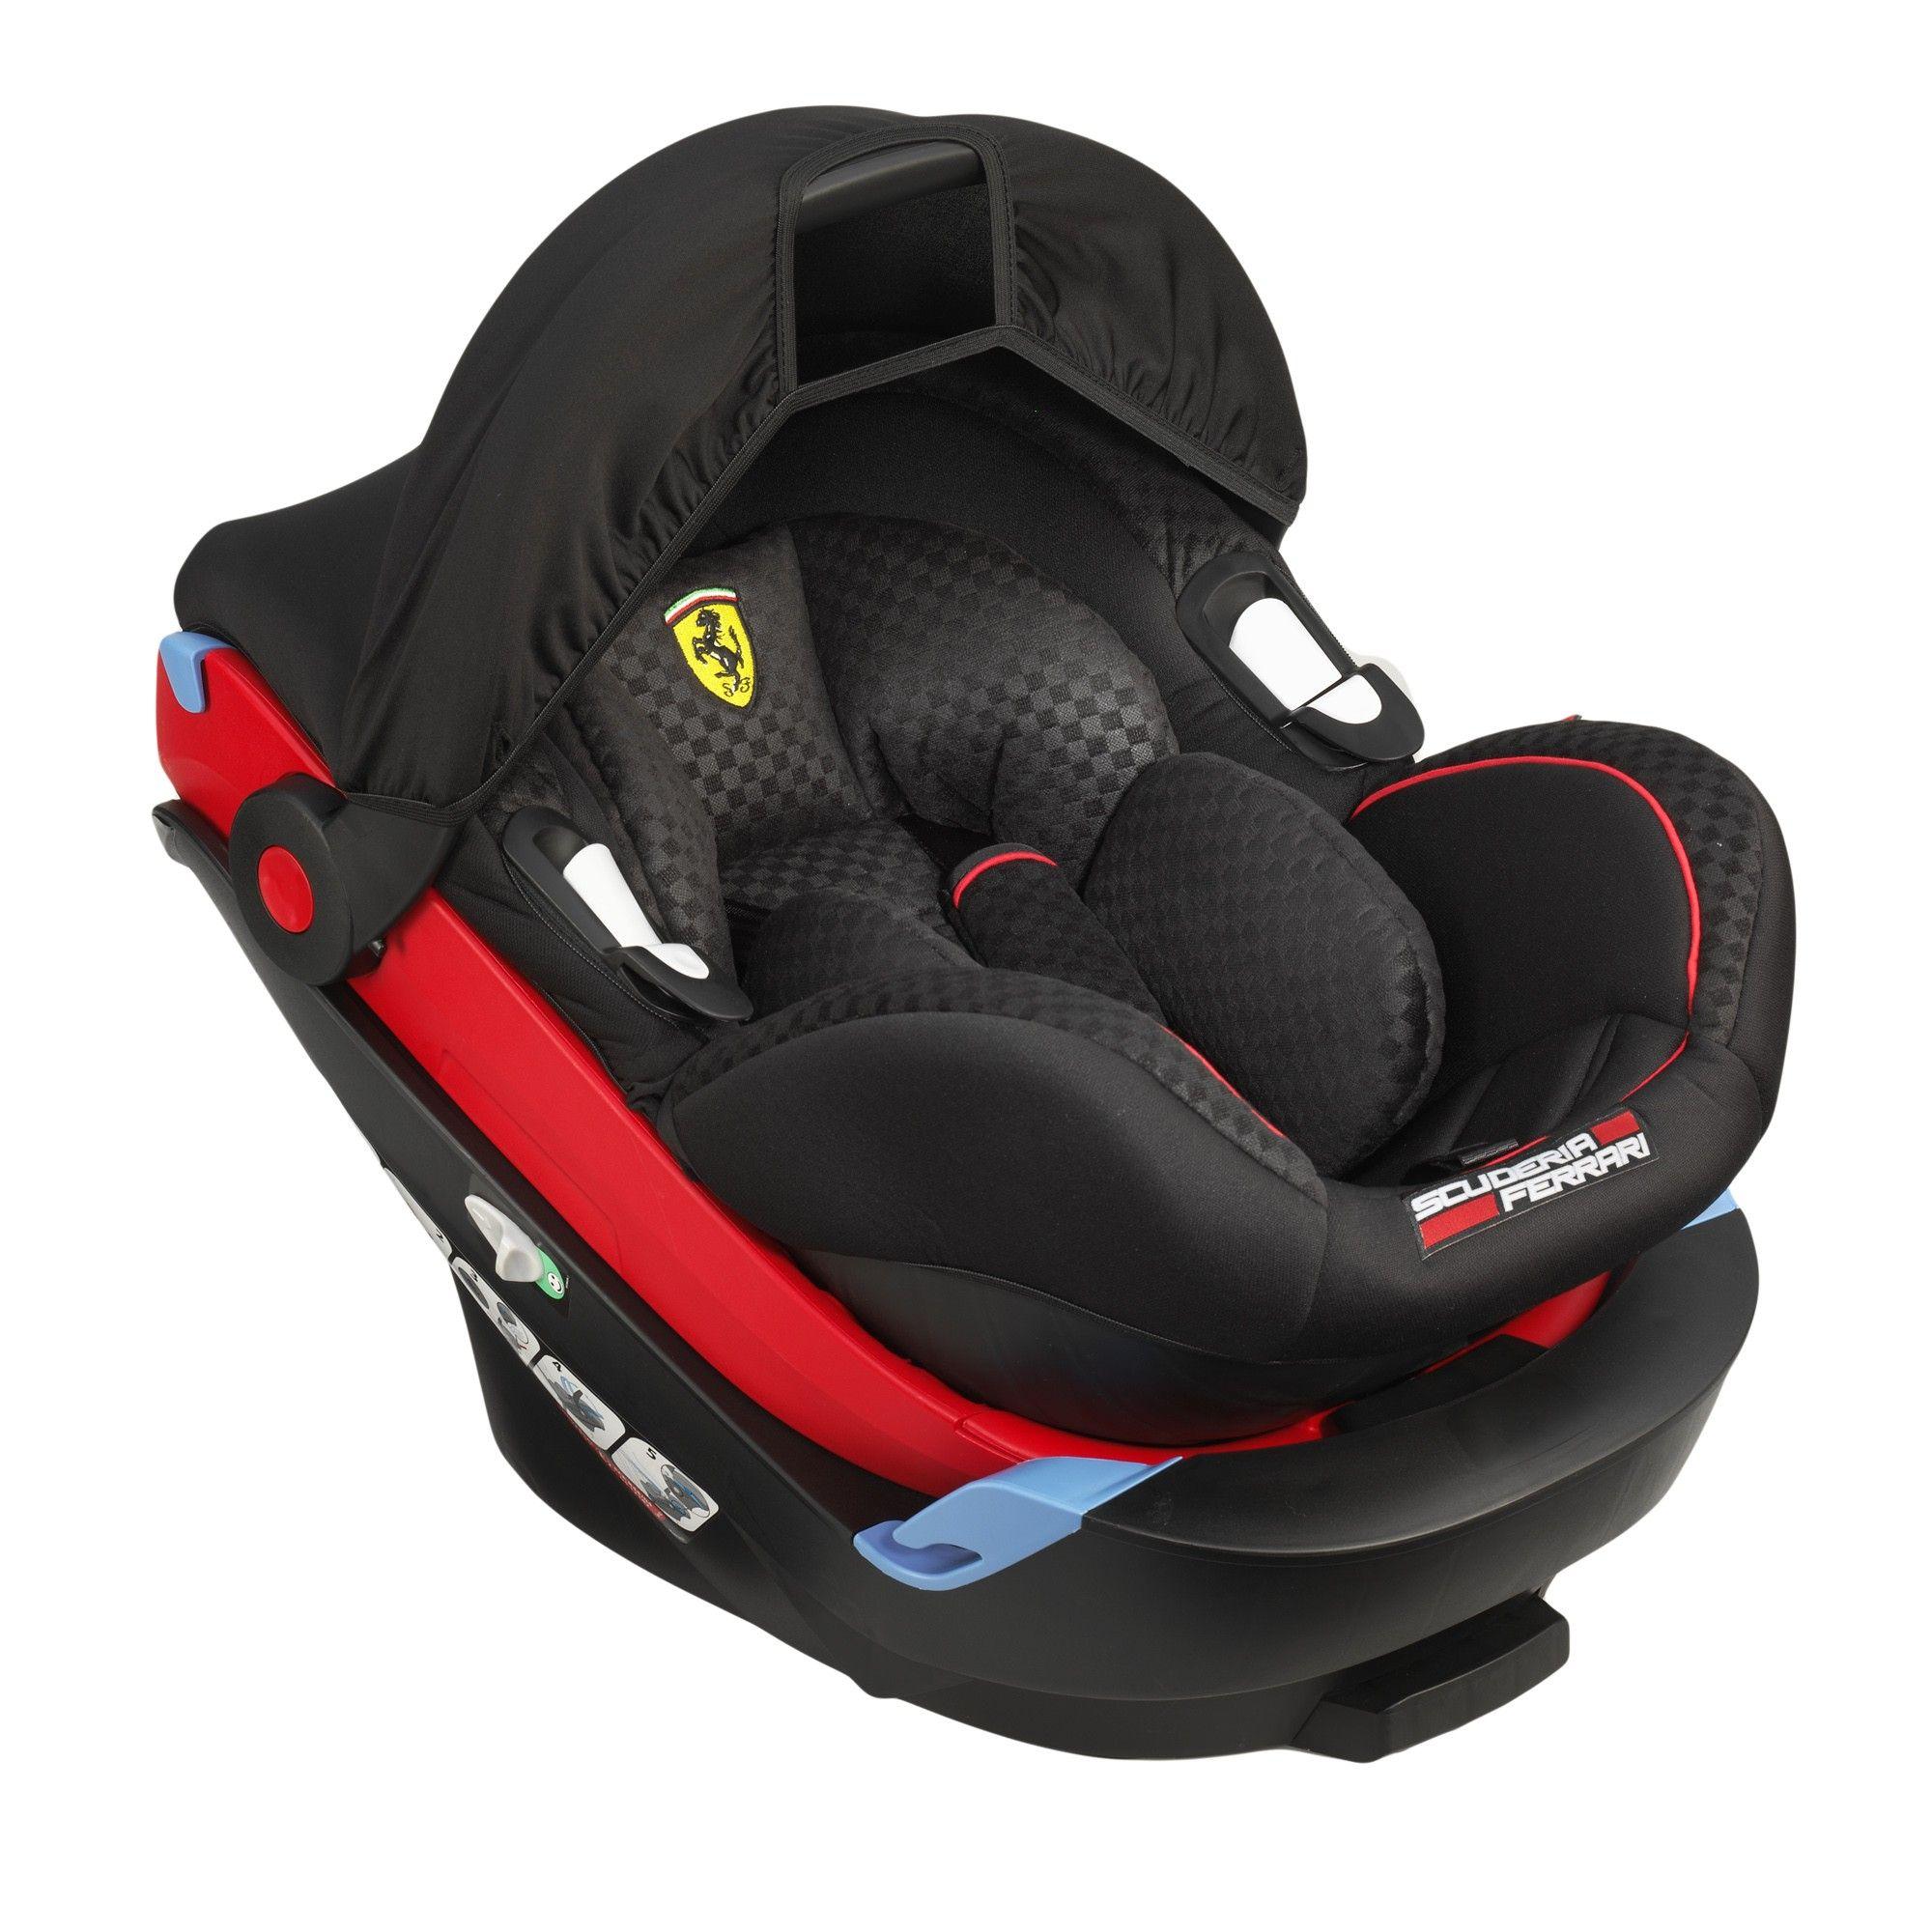 Ferrari Store Ferrari Migo Satellite Child Car Seat Shopping